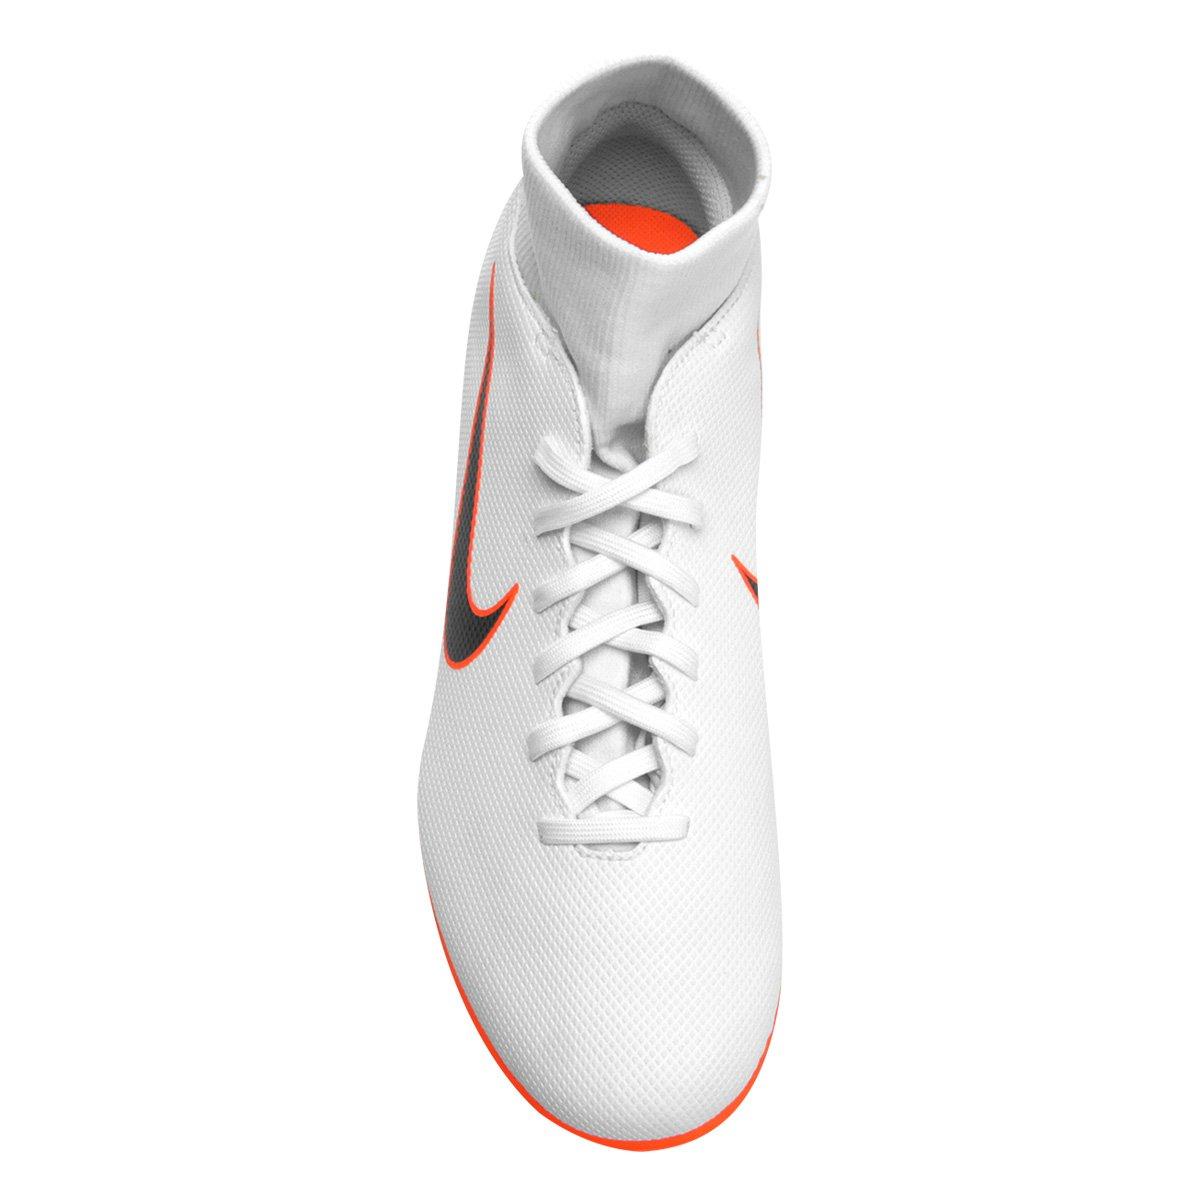 Masculina Branco Nike Chuteira 6 Campo Club Mercurial e Cinza Superfly xTO6vYwqv